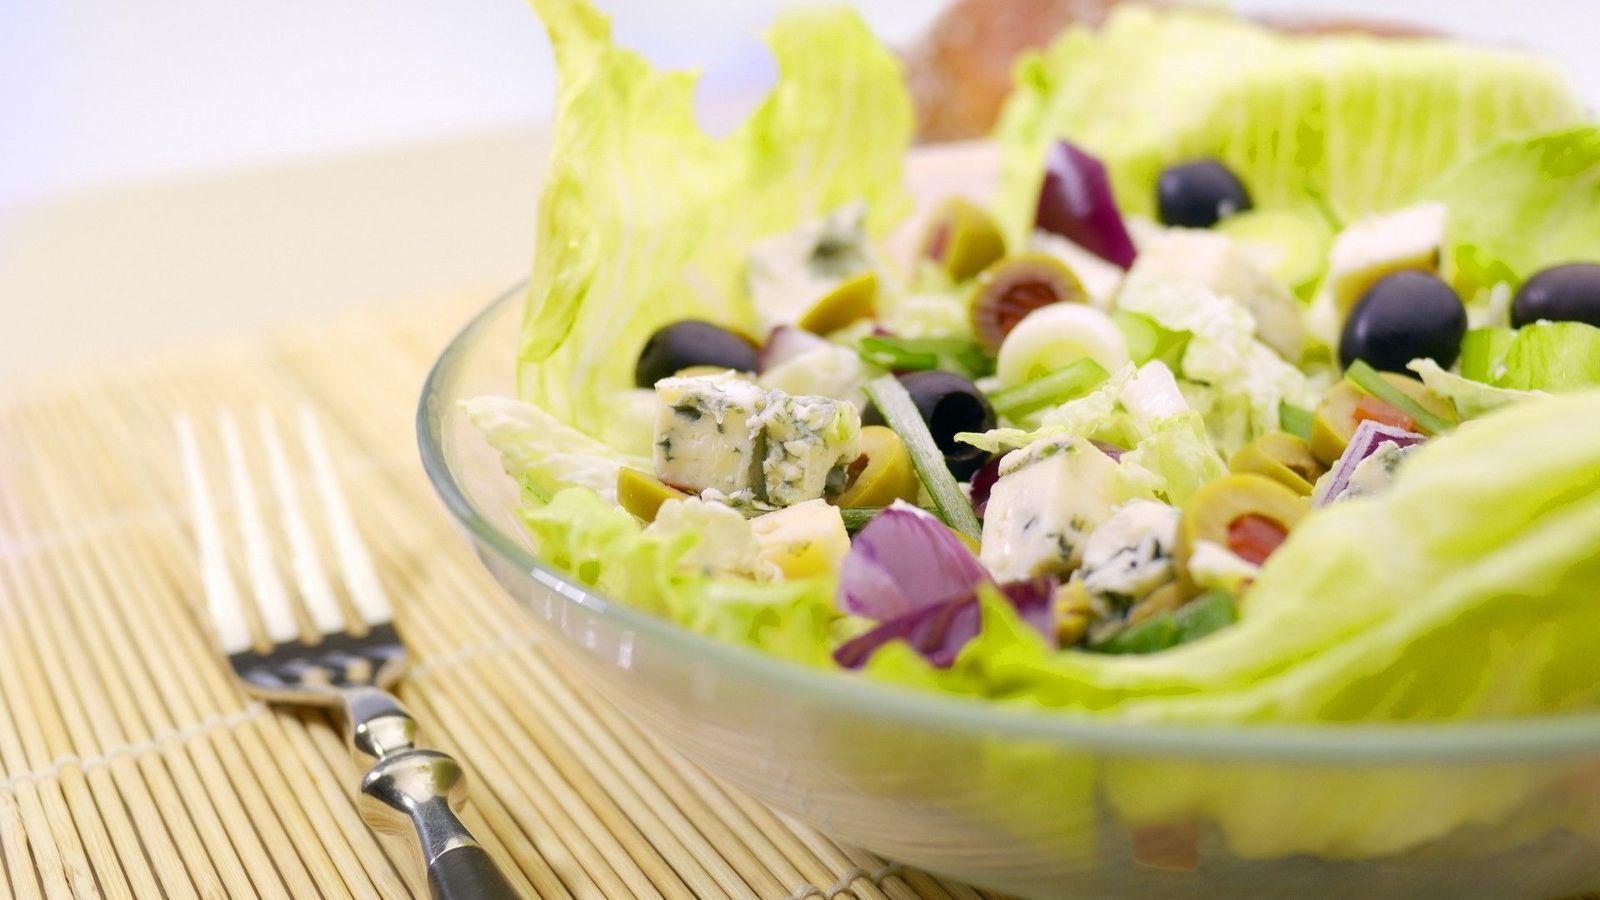 Bon appétit - Salade - Wallpaper - Free